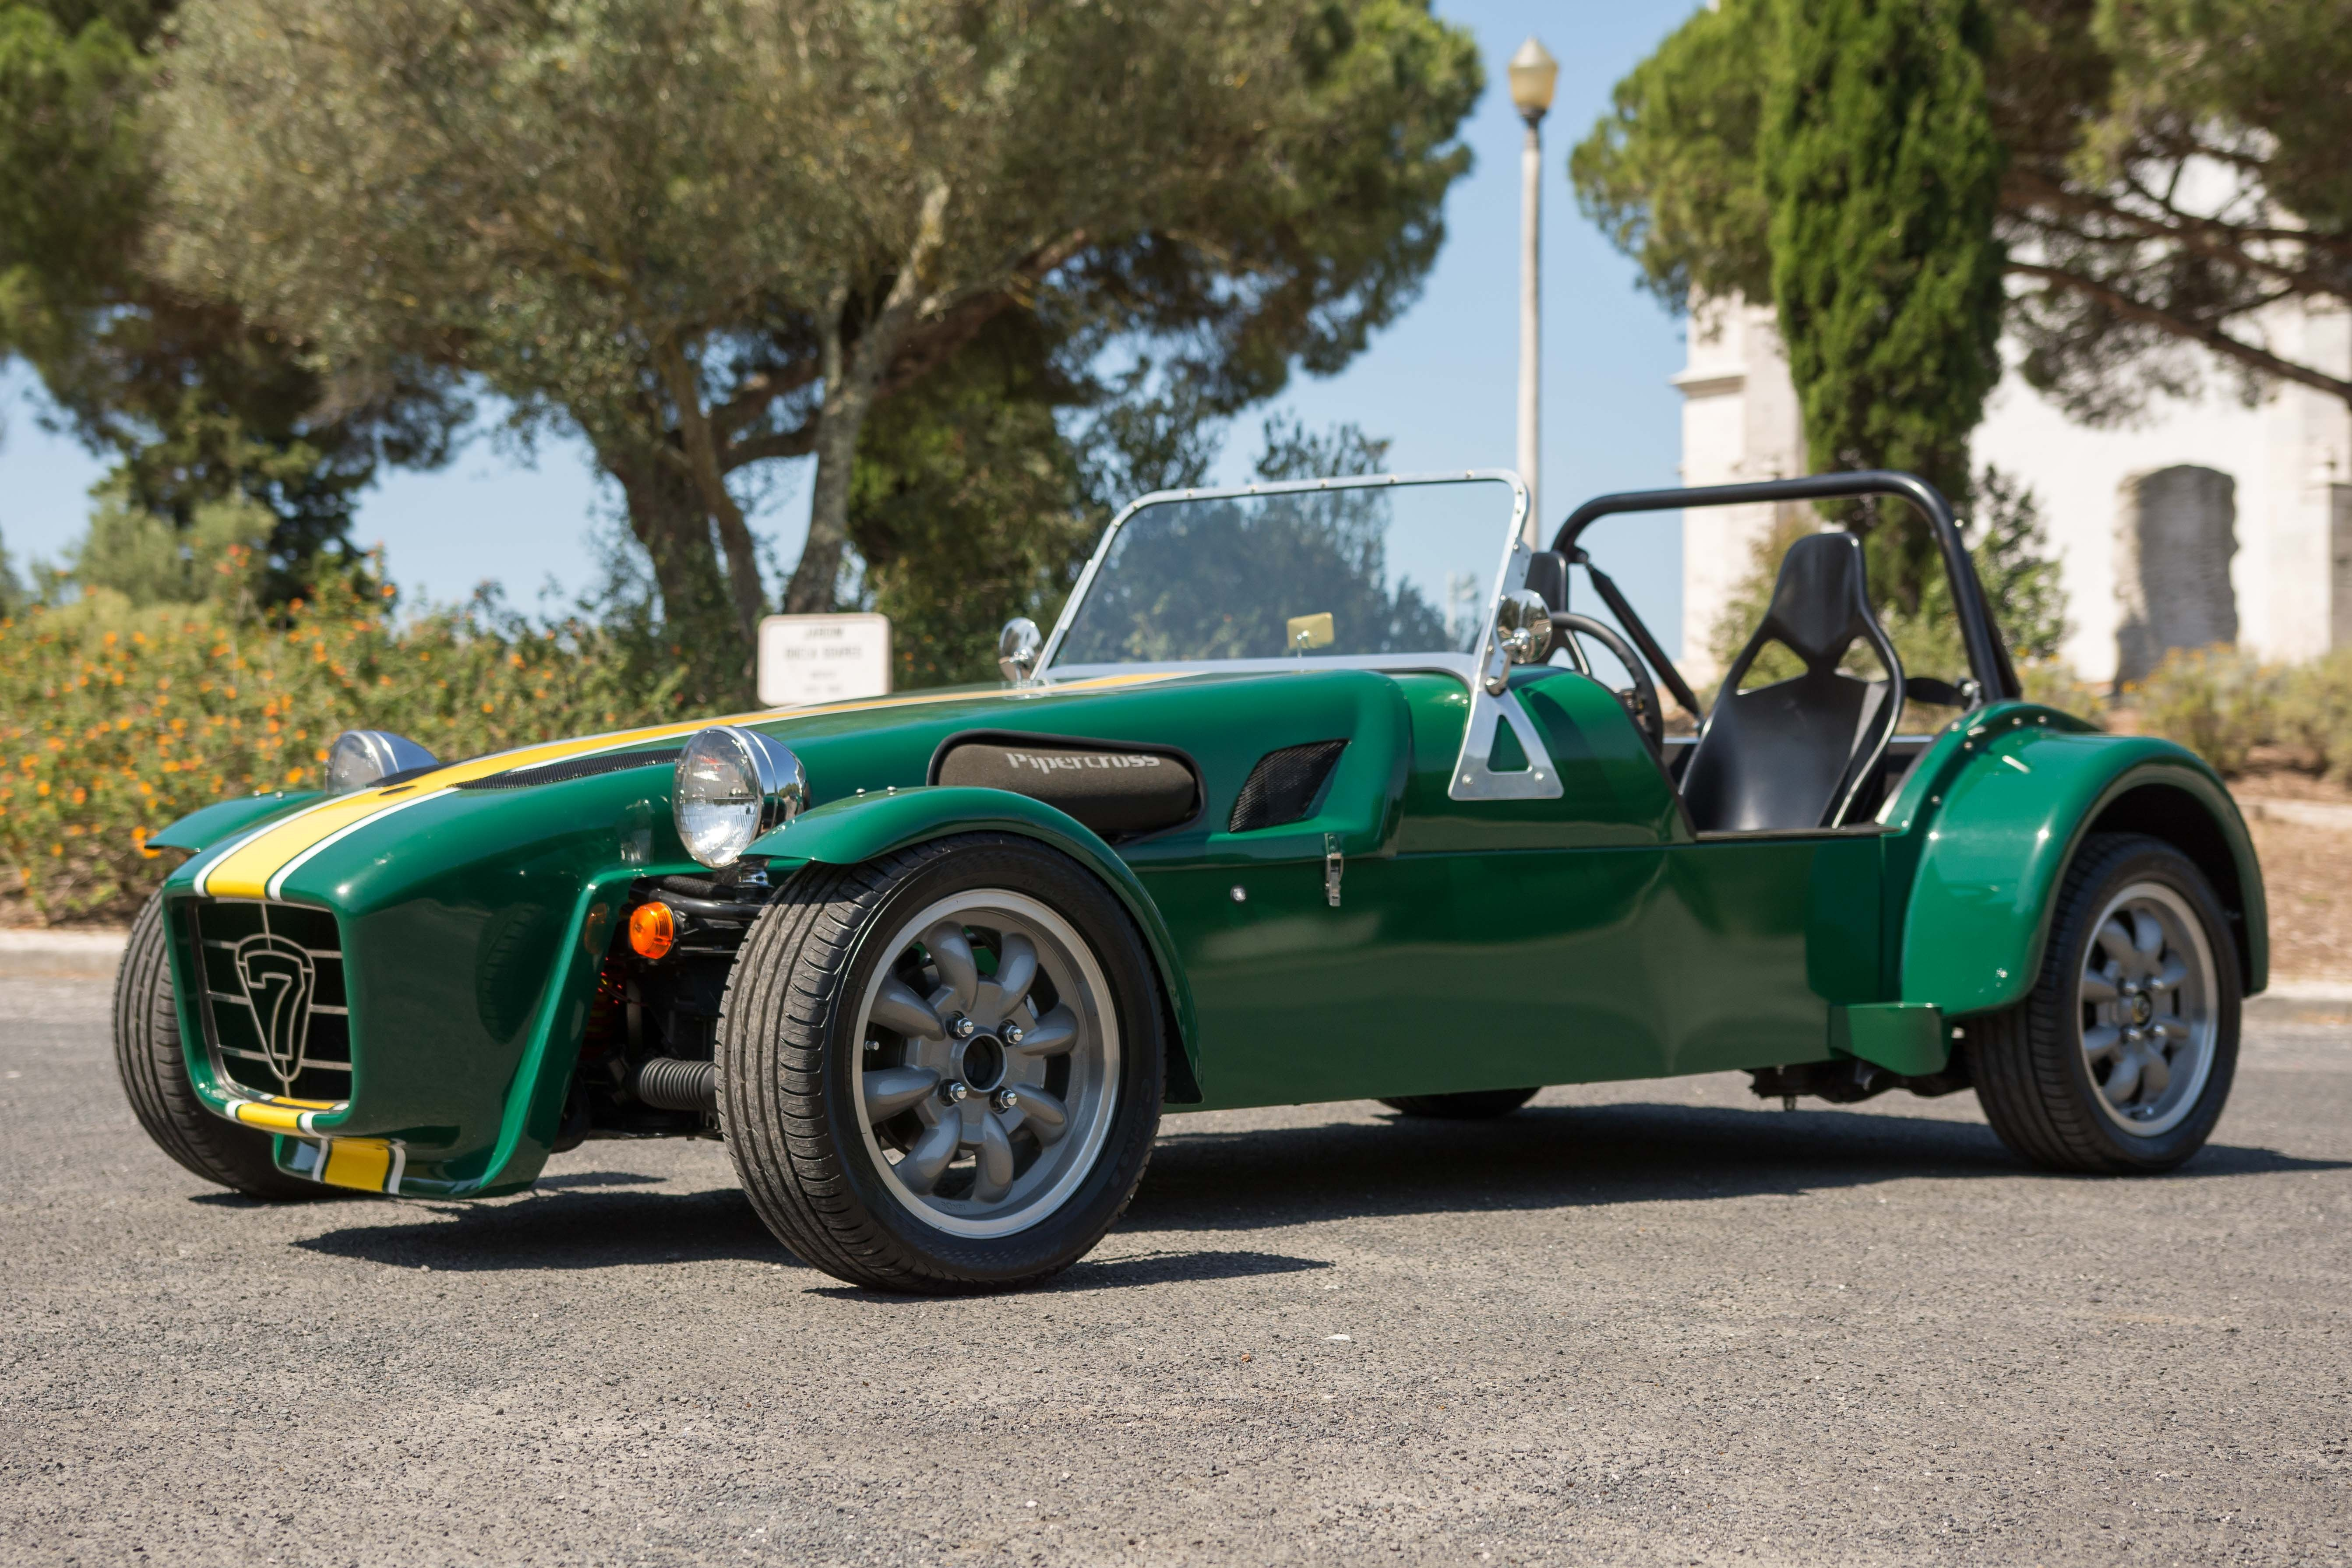 caterham_seven-2 Mesmerizing Lotus Carlton for Sale 2015 Cars Trend